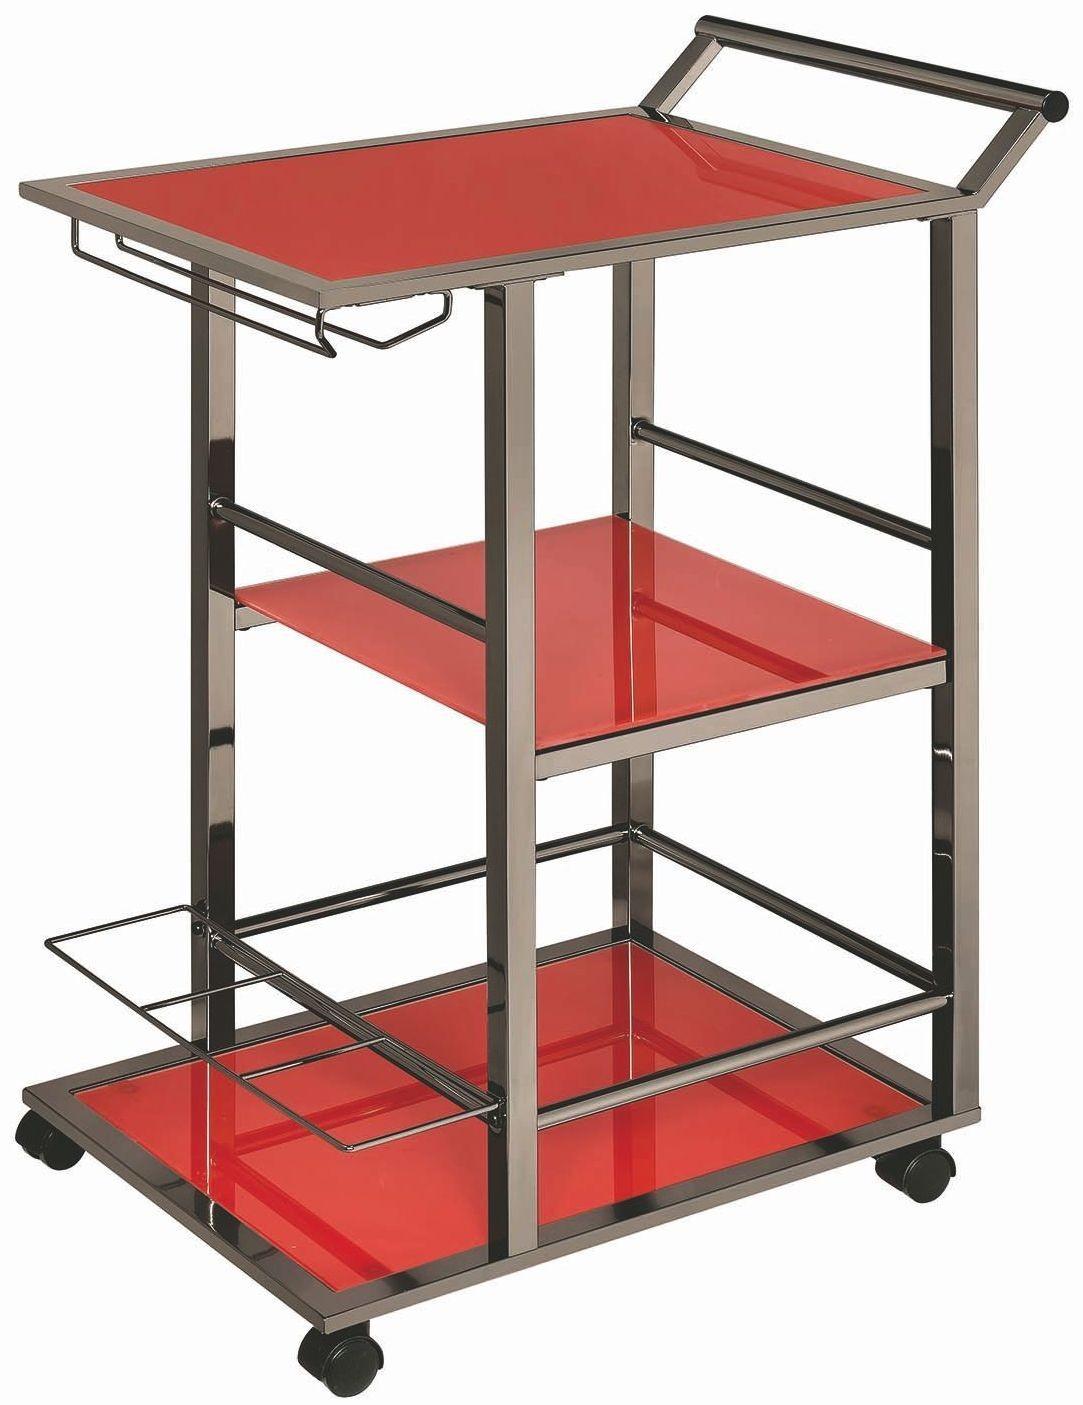 Rec Room Black Nickel and Red Serving Cart